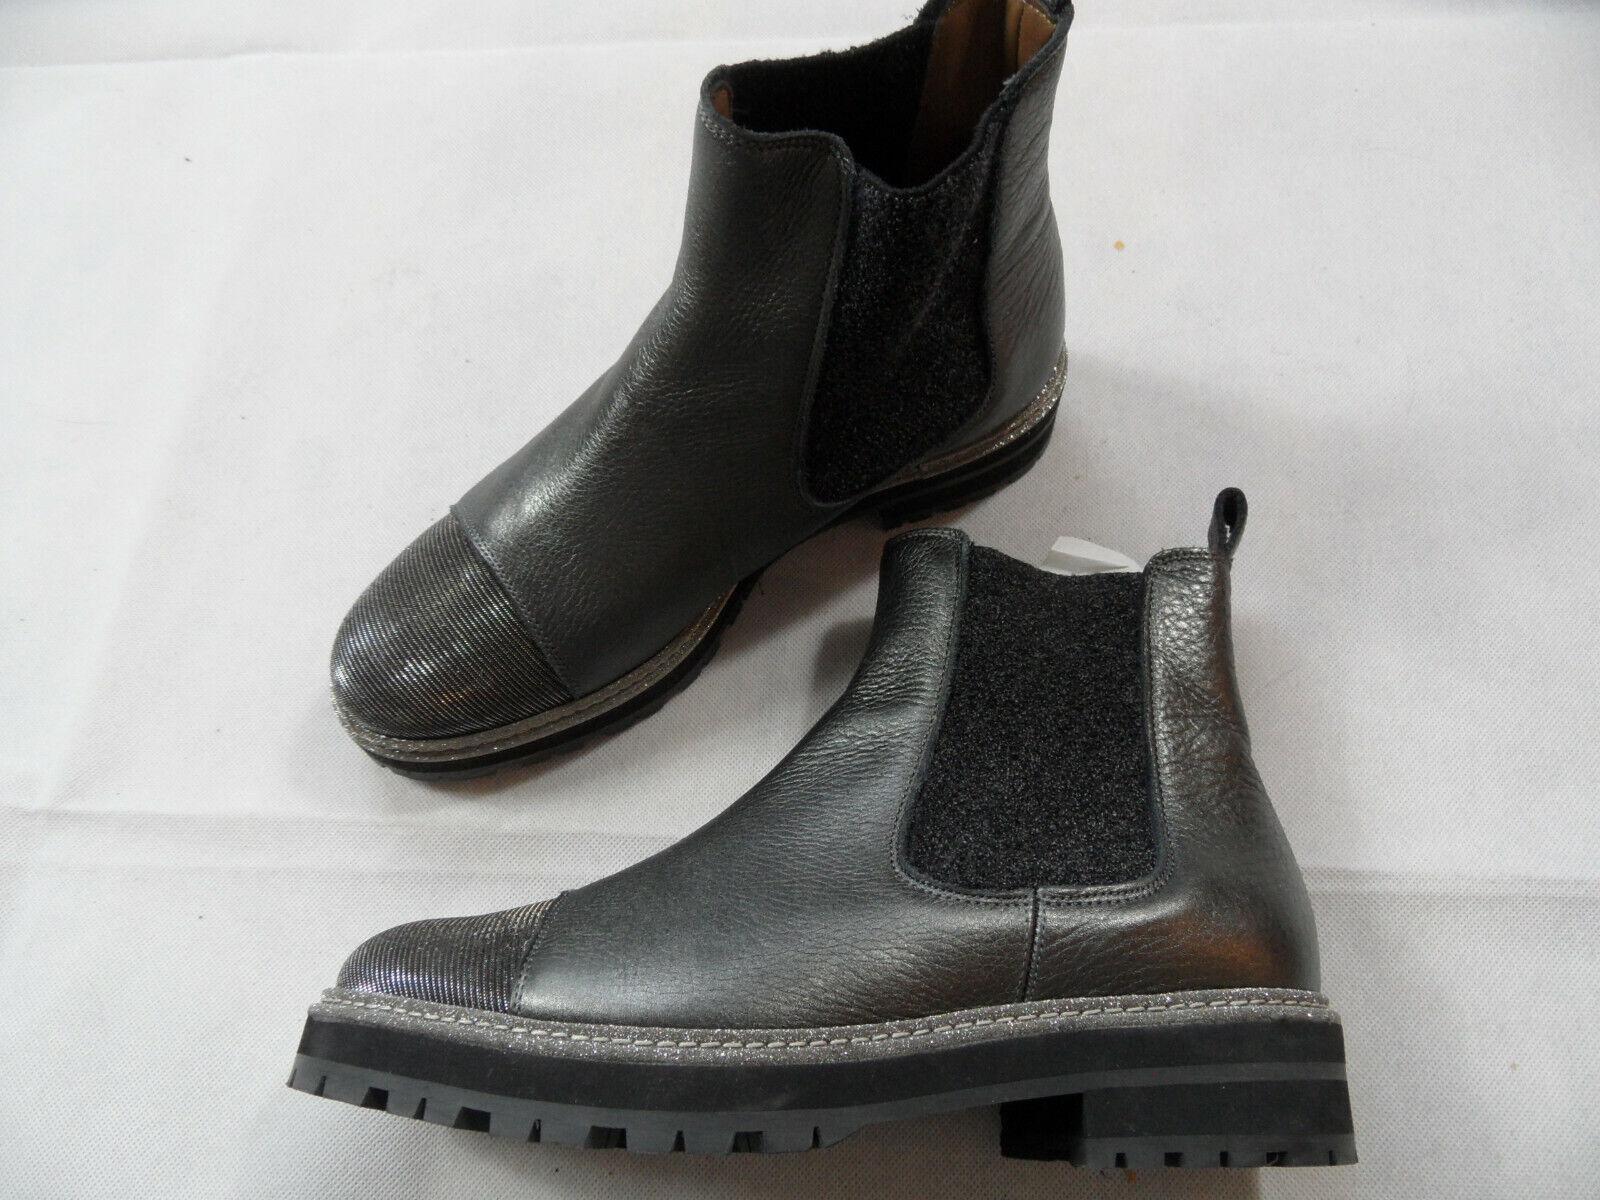 PERTINI élégants bottes bottes bottes kurzbottes bronze taille 39 top je219 7c5569